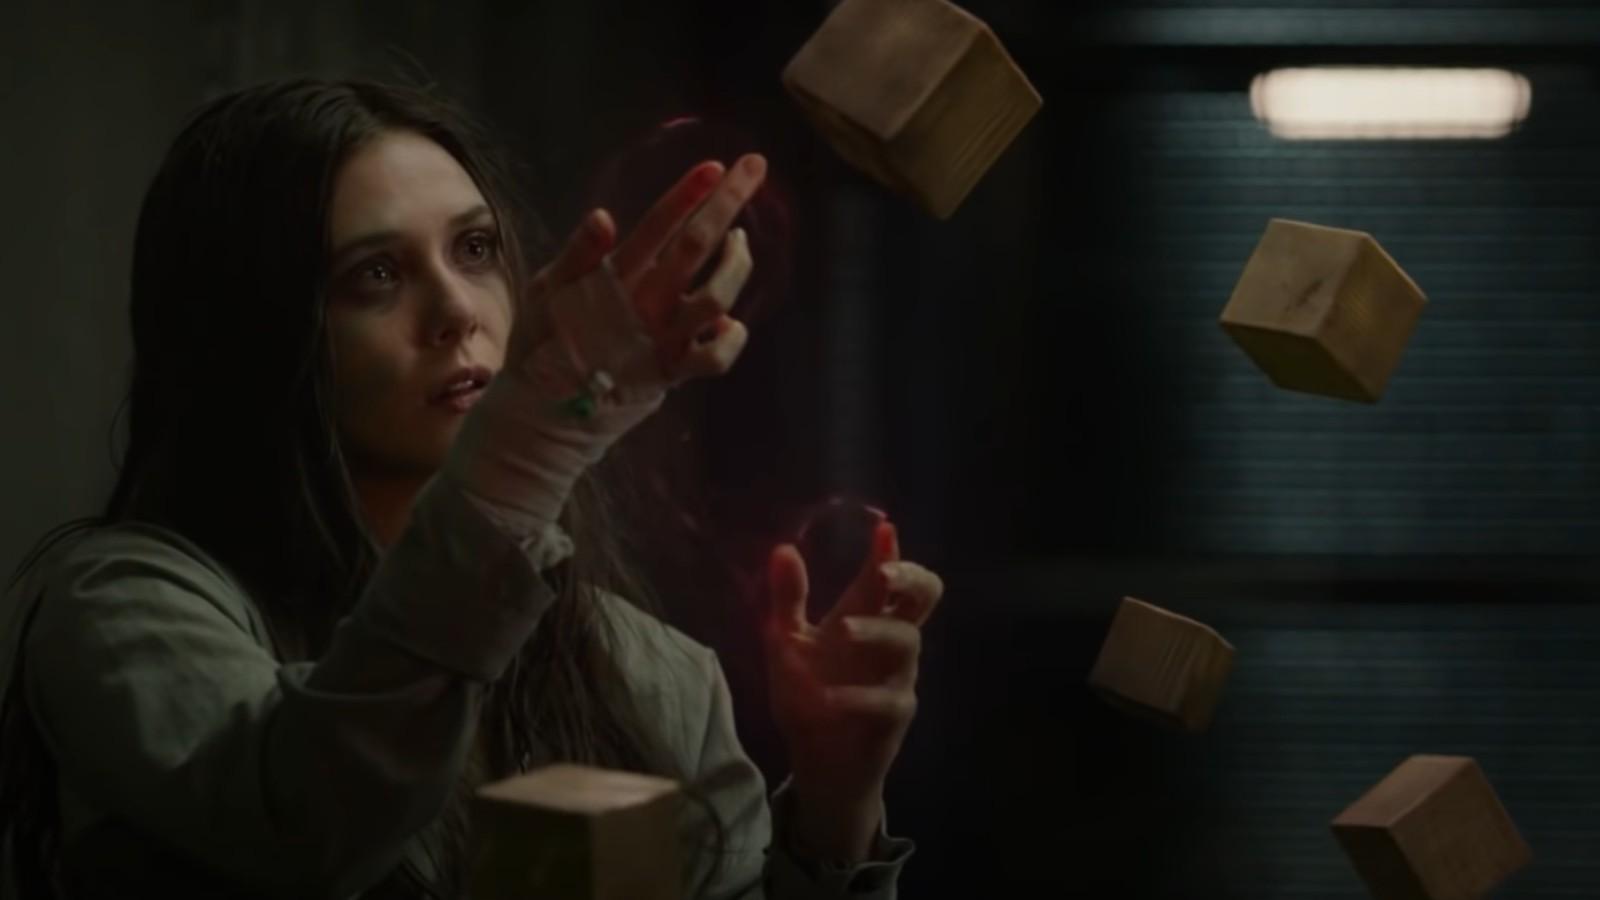 Wanda in Captain America Winter Soldier post credit scene